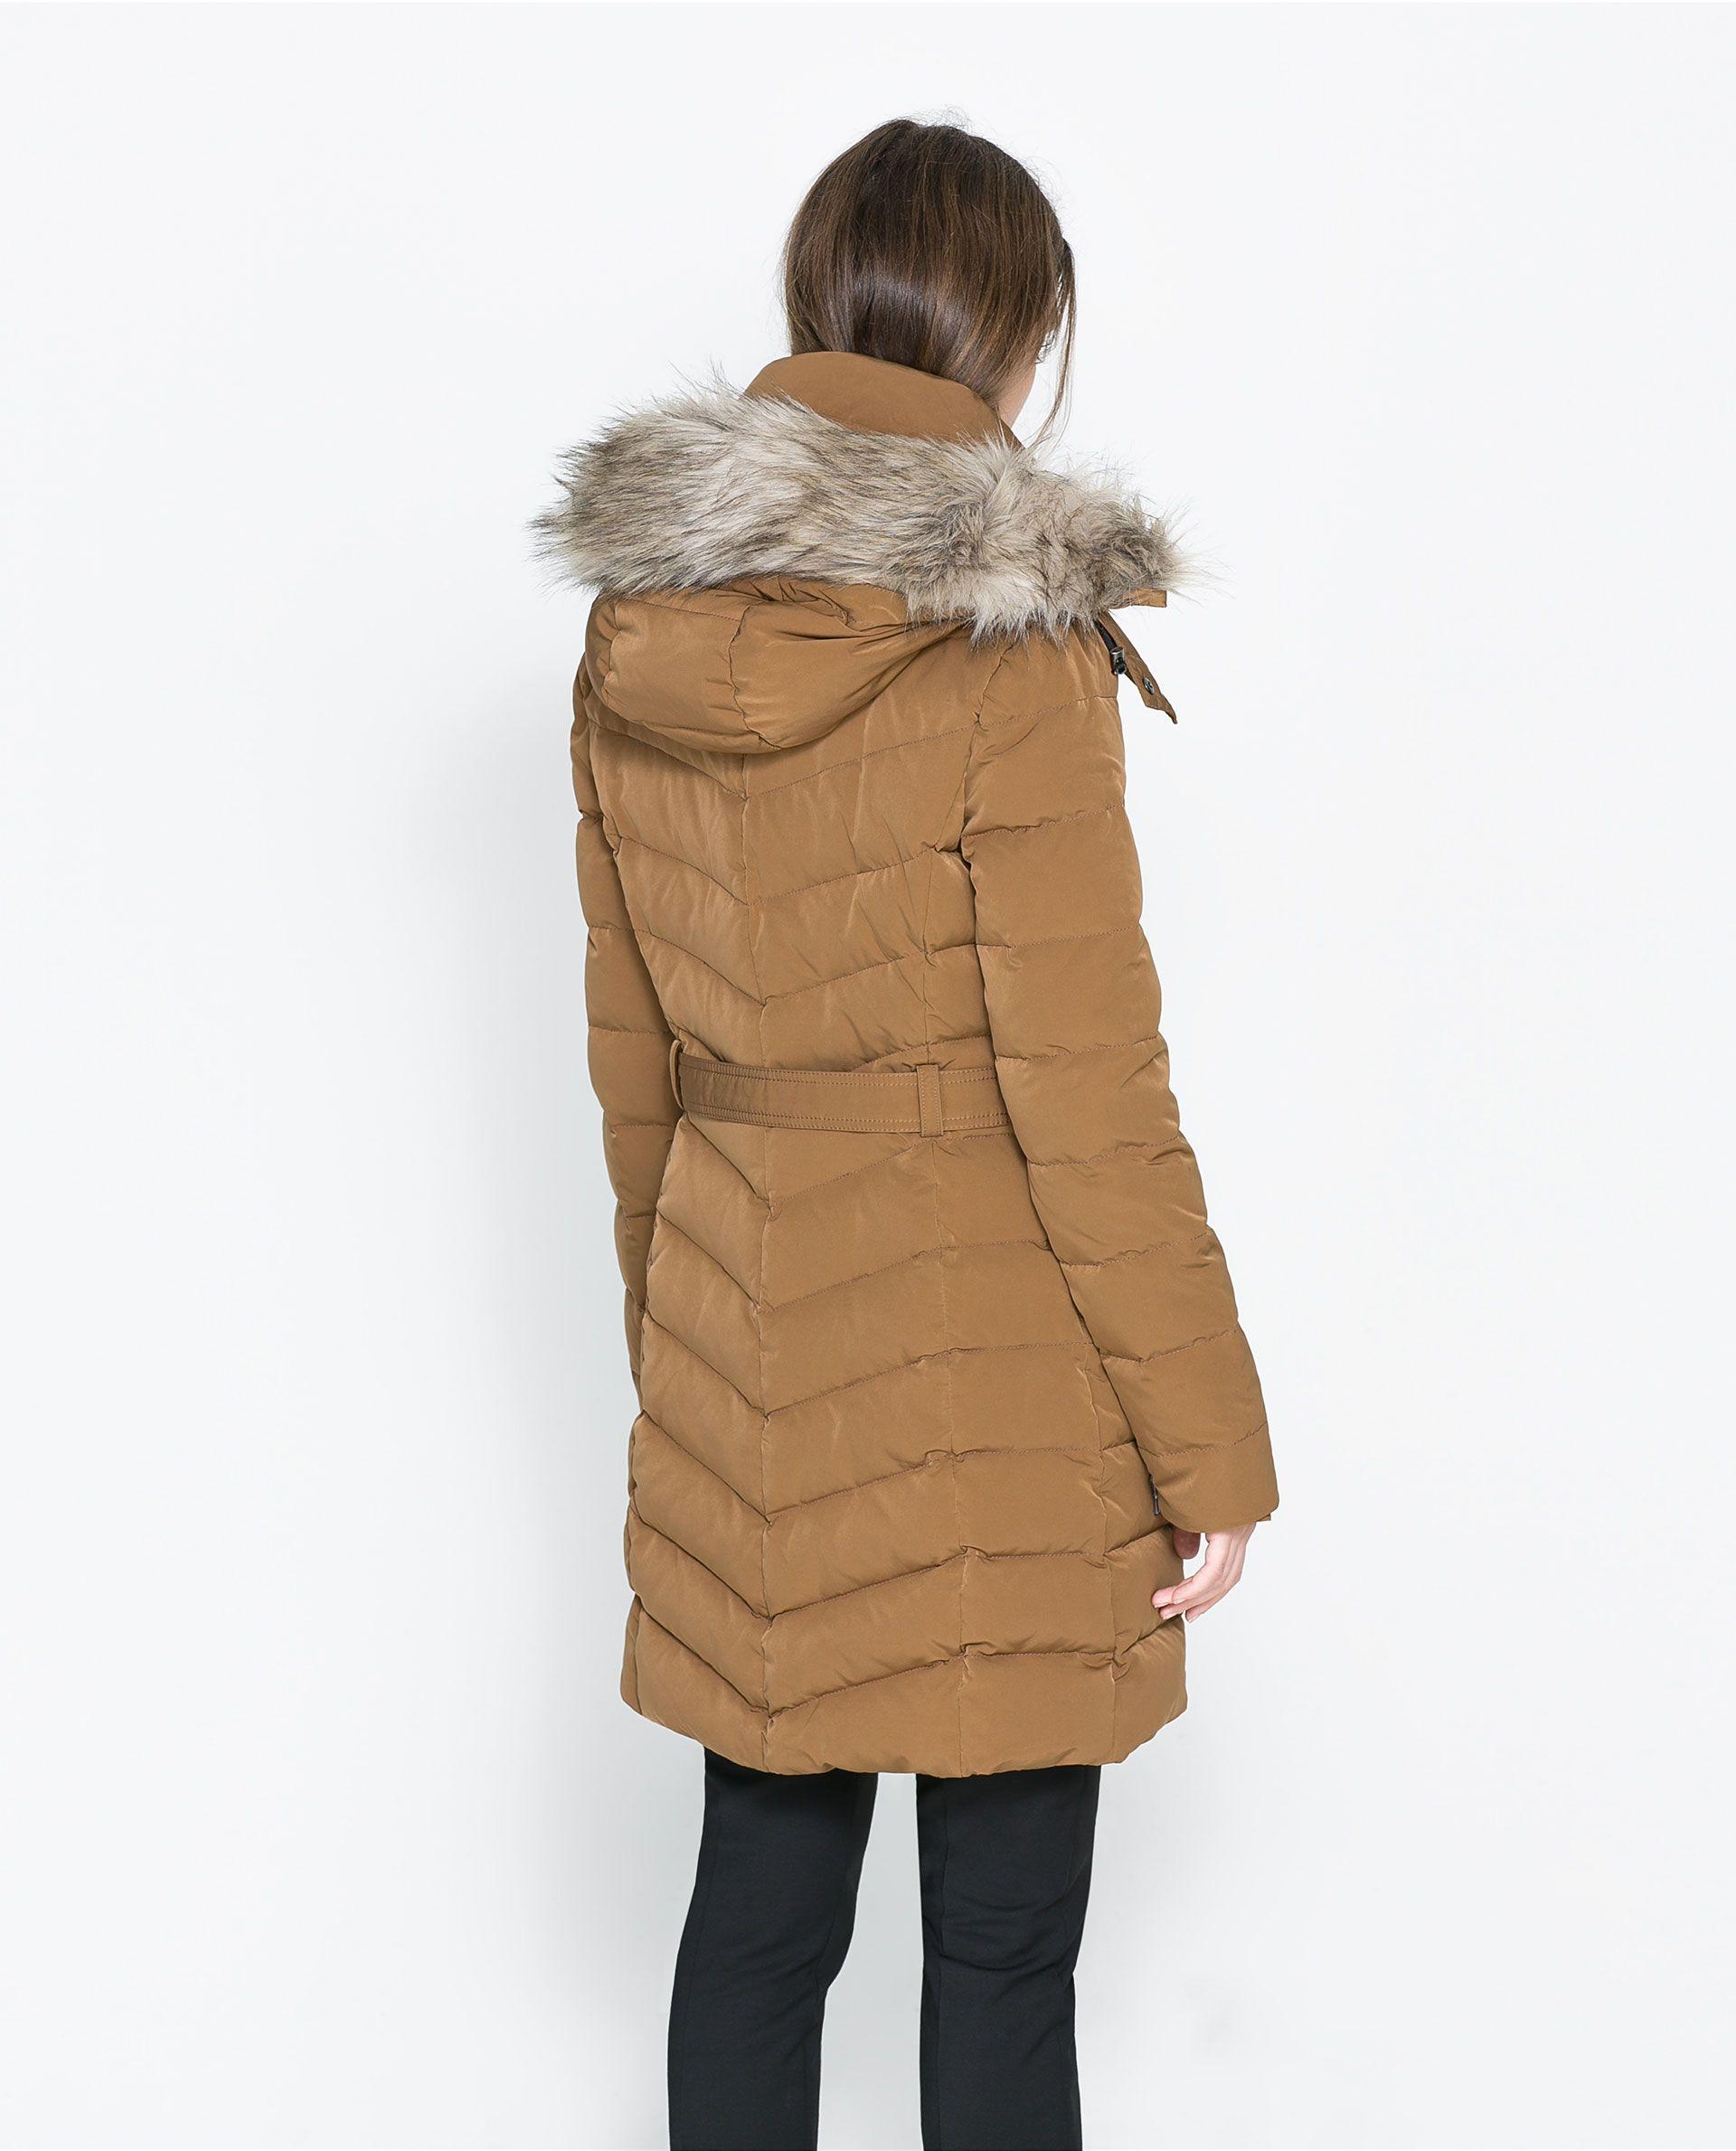 031c0655cc4e Zara Medium Length Puffer Jacket with Hood in Beige (Caramel)